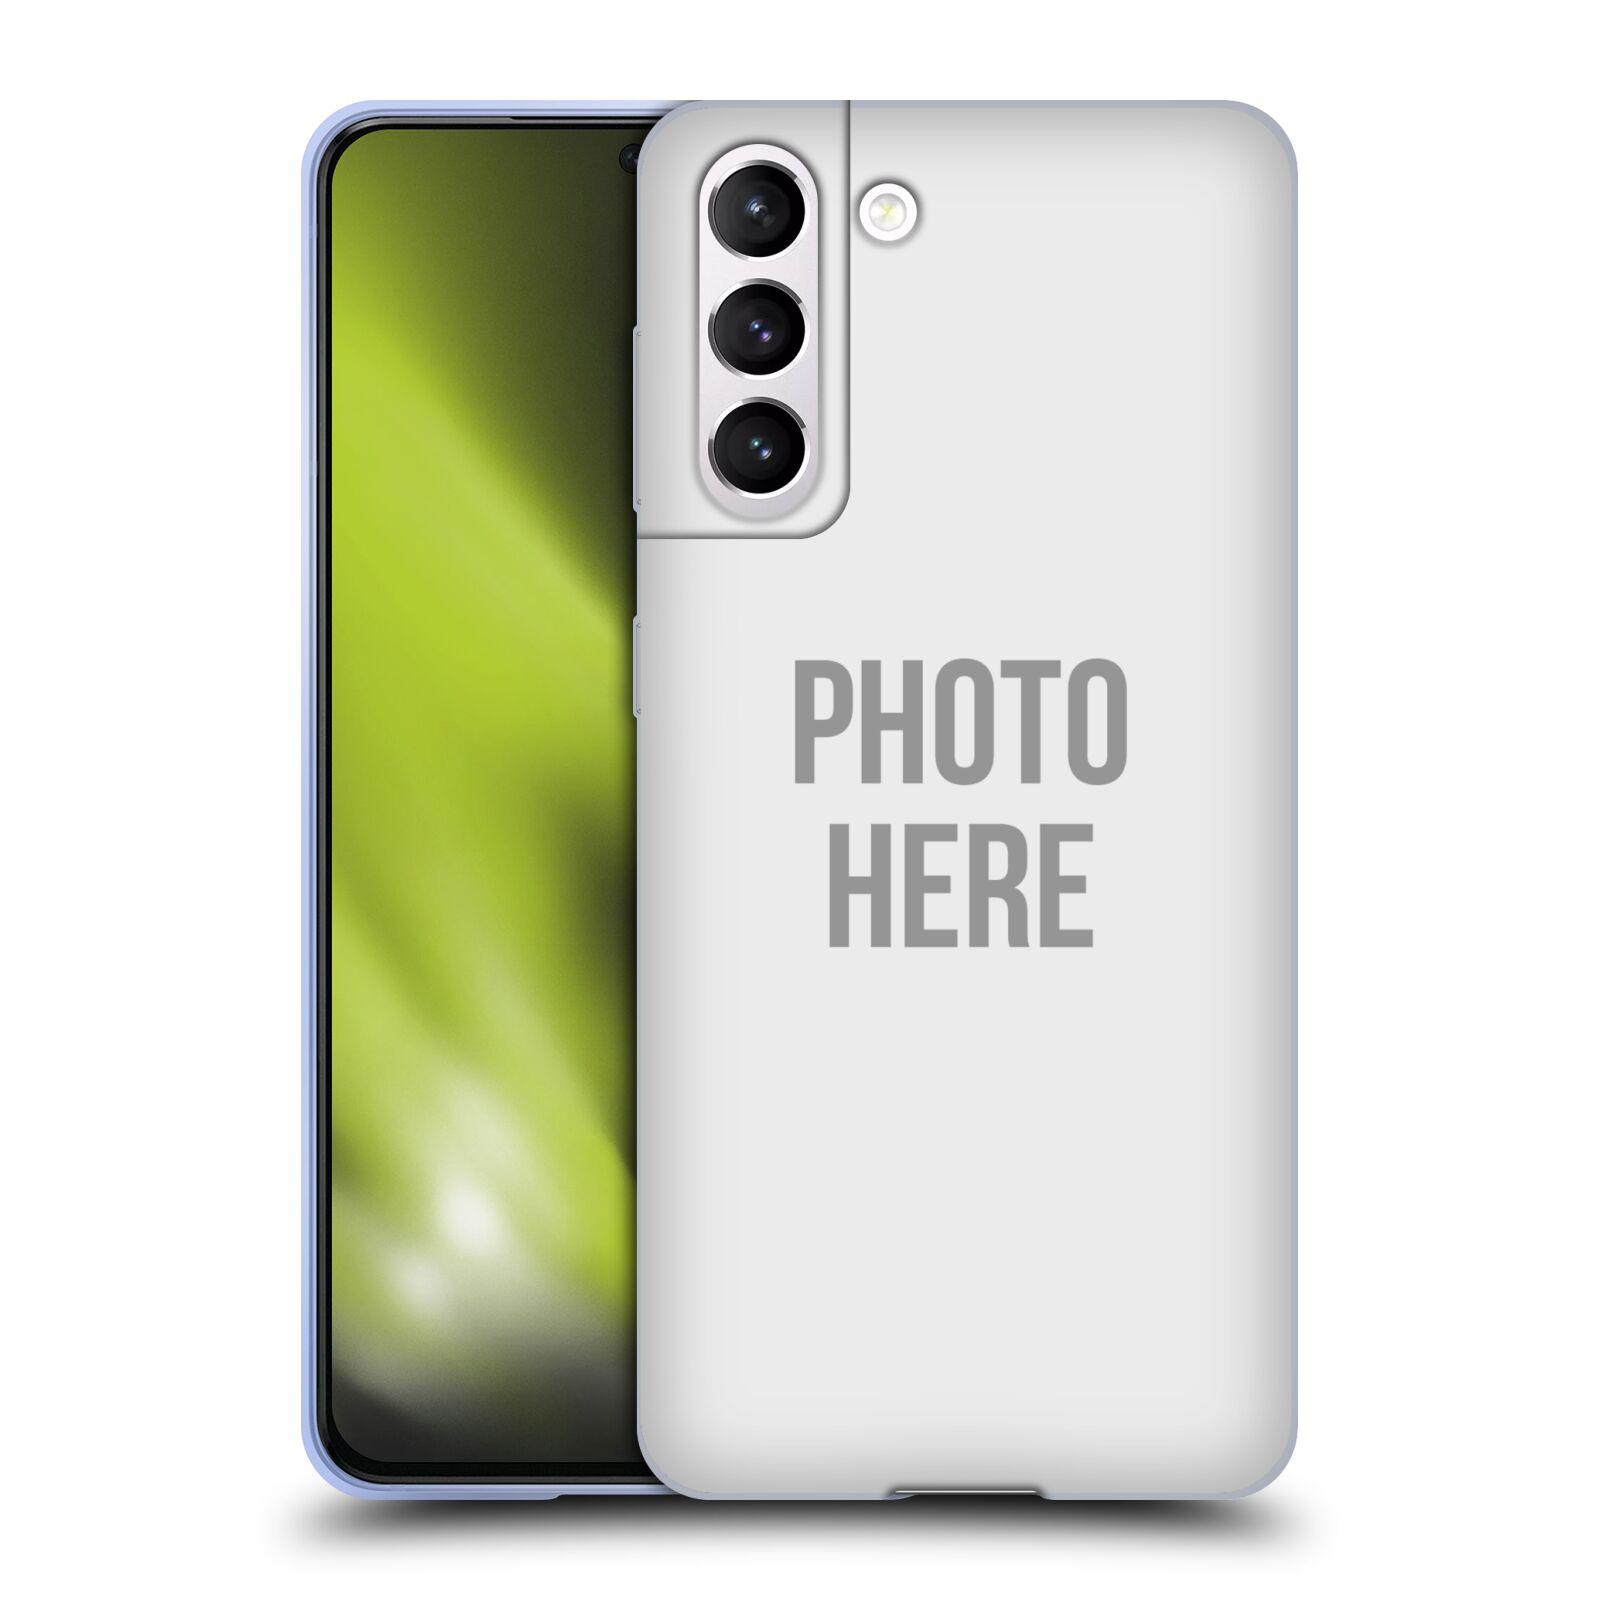 Silikonové pouzdro na mobil Samsung Galaxy S21 5G s vlastním motivem